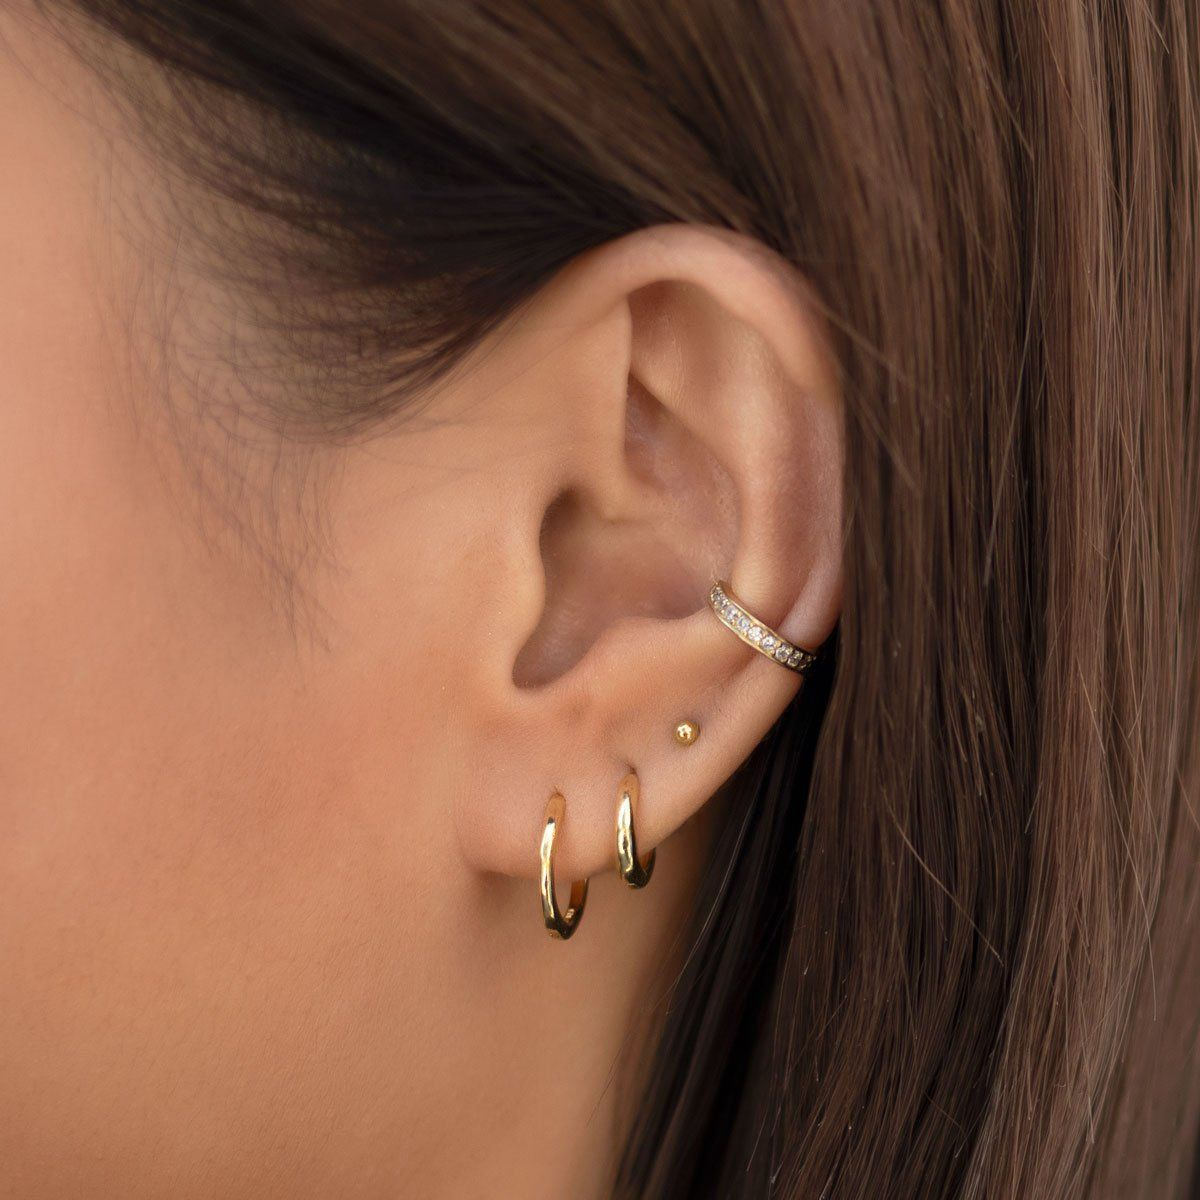 Pave Crystal Gold Huggie Hoop Earrings | Minimal Dainty Jewelry – AMY O Jewelry